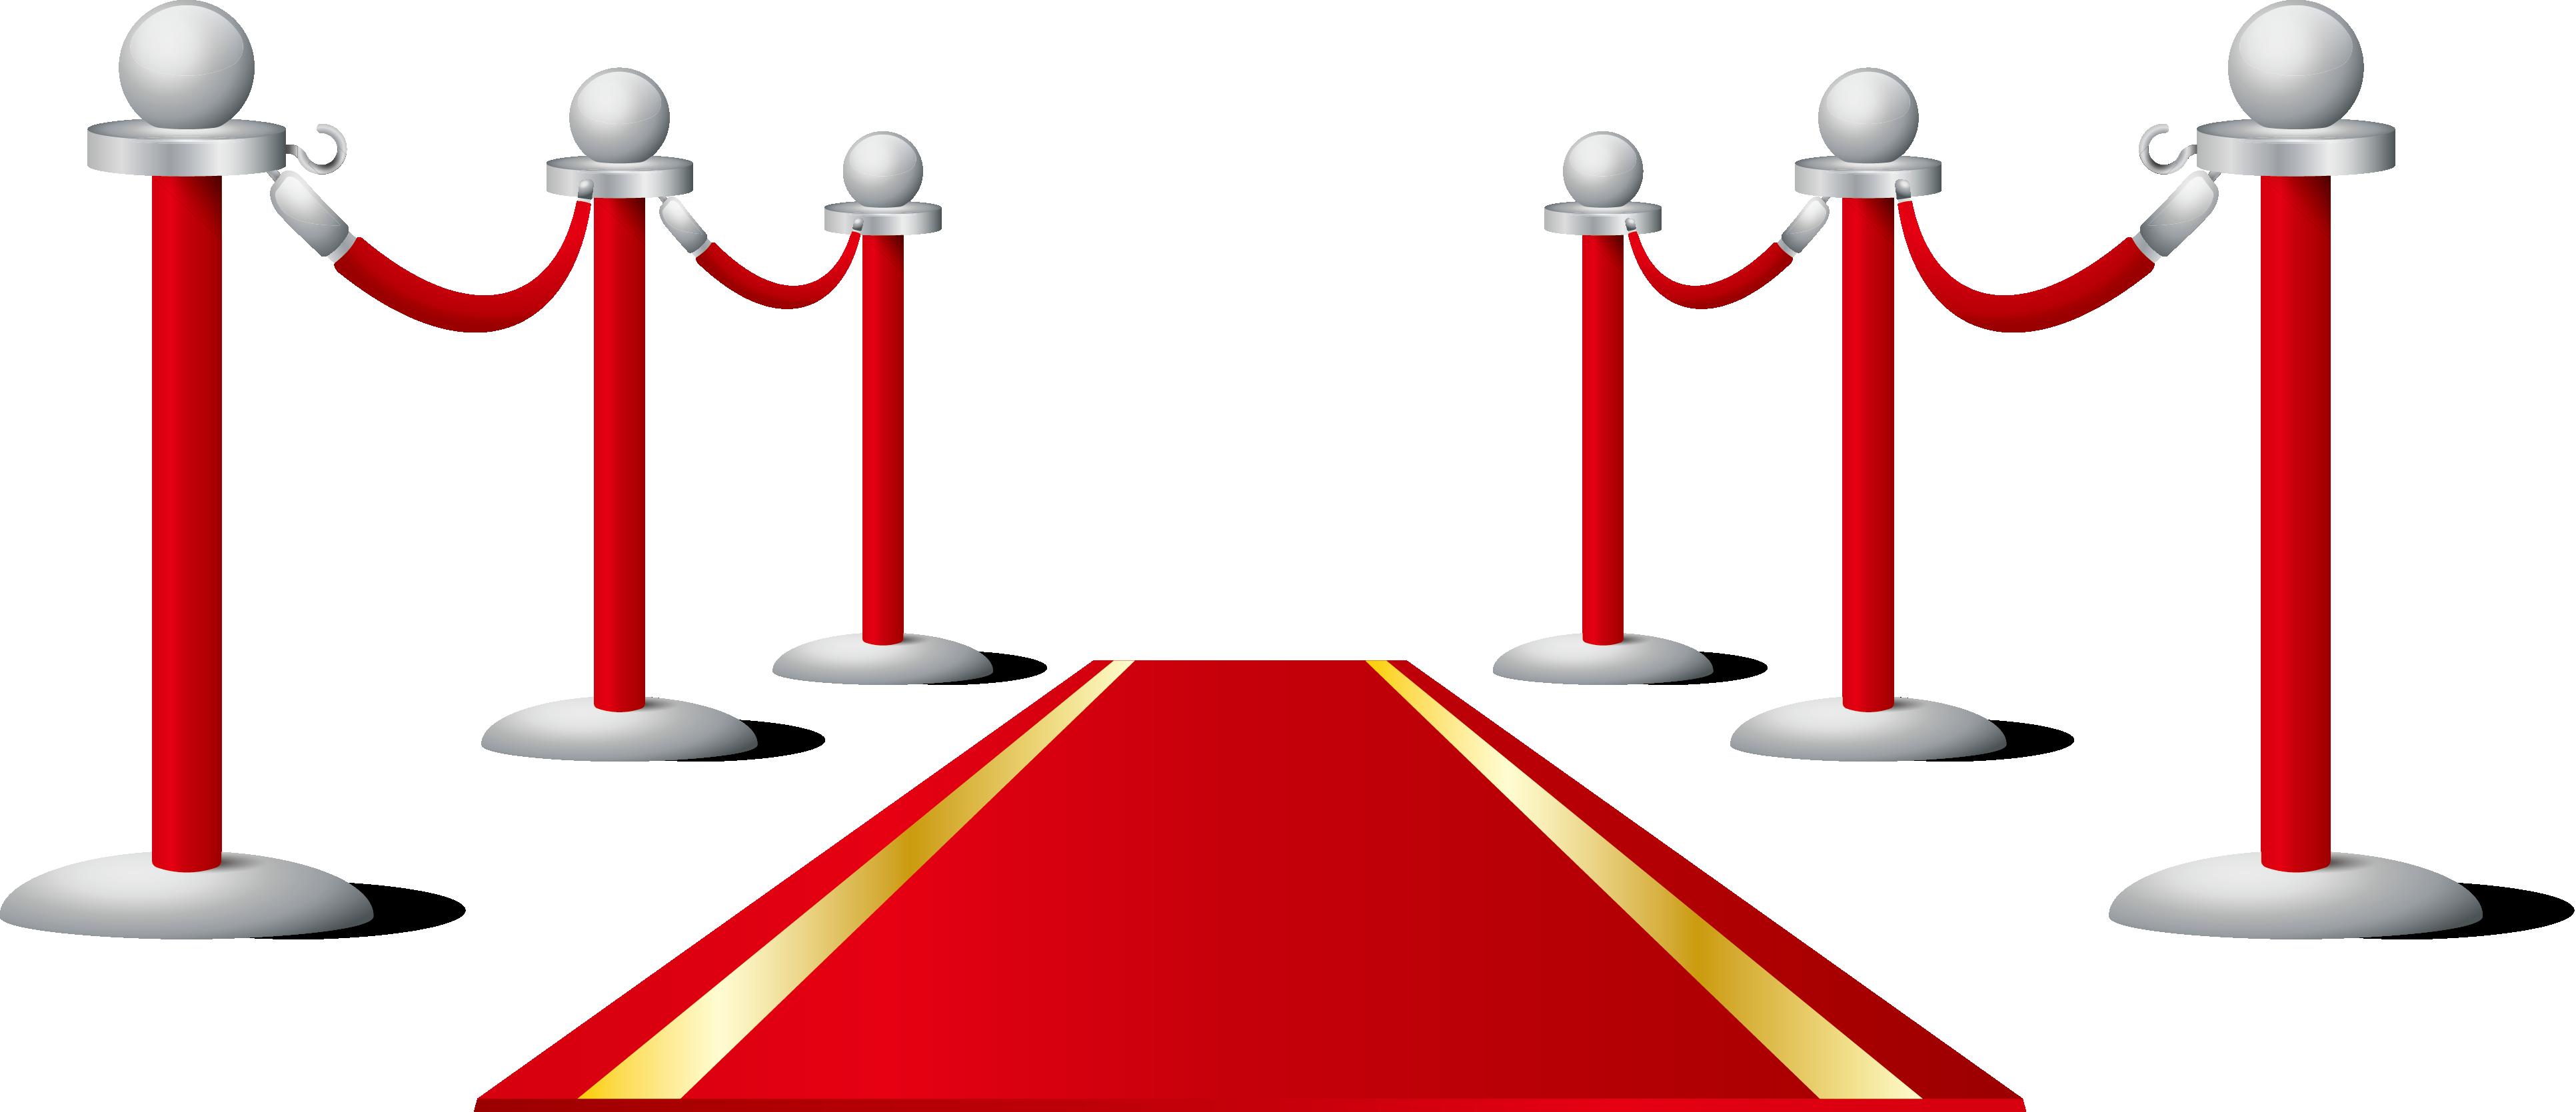 3865x1669 Euclidean Vector Red Carpet Red Carpet